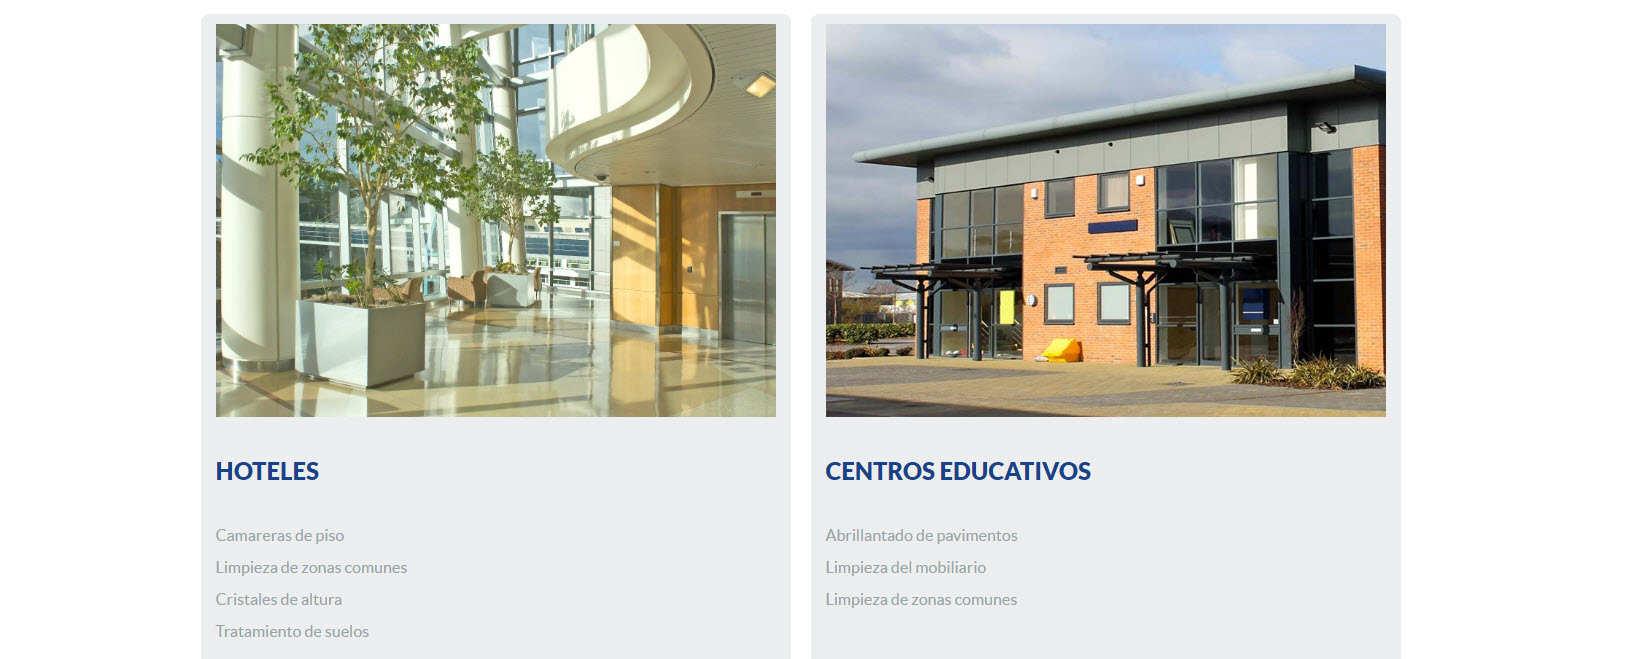 agencia-marketing-management-outsourcing-lifting-group-estrategia-seo-sem-2